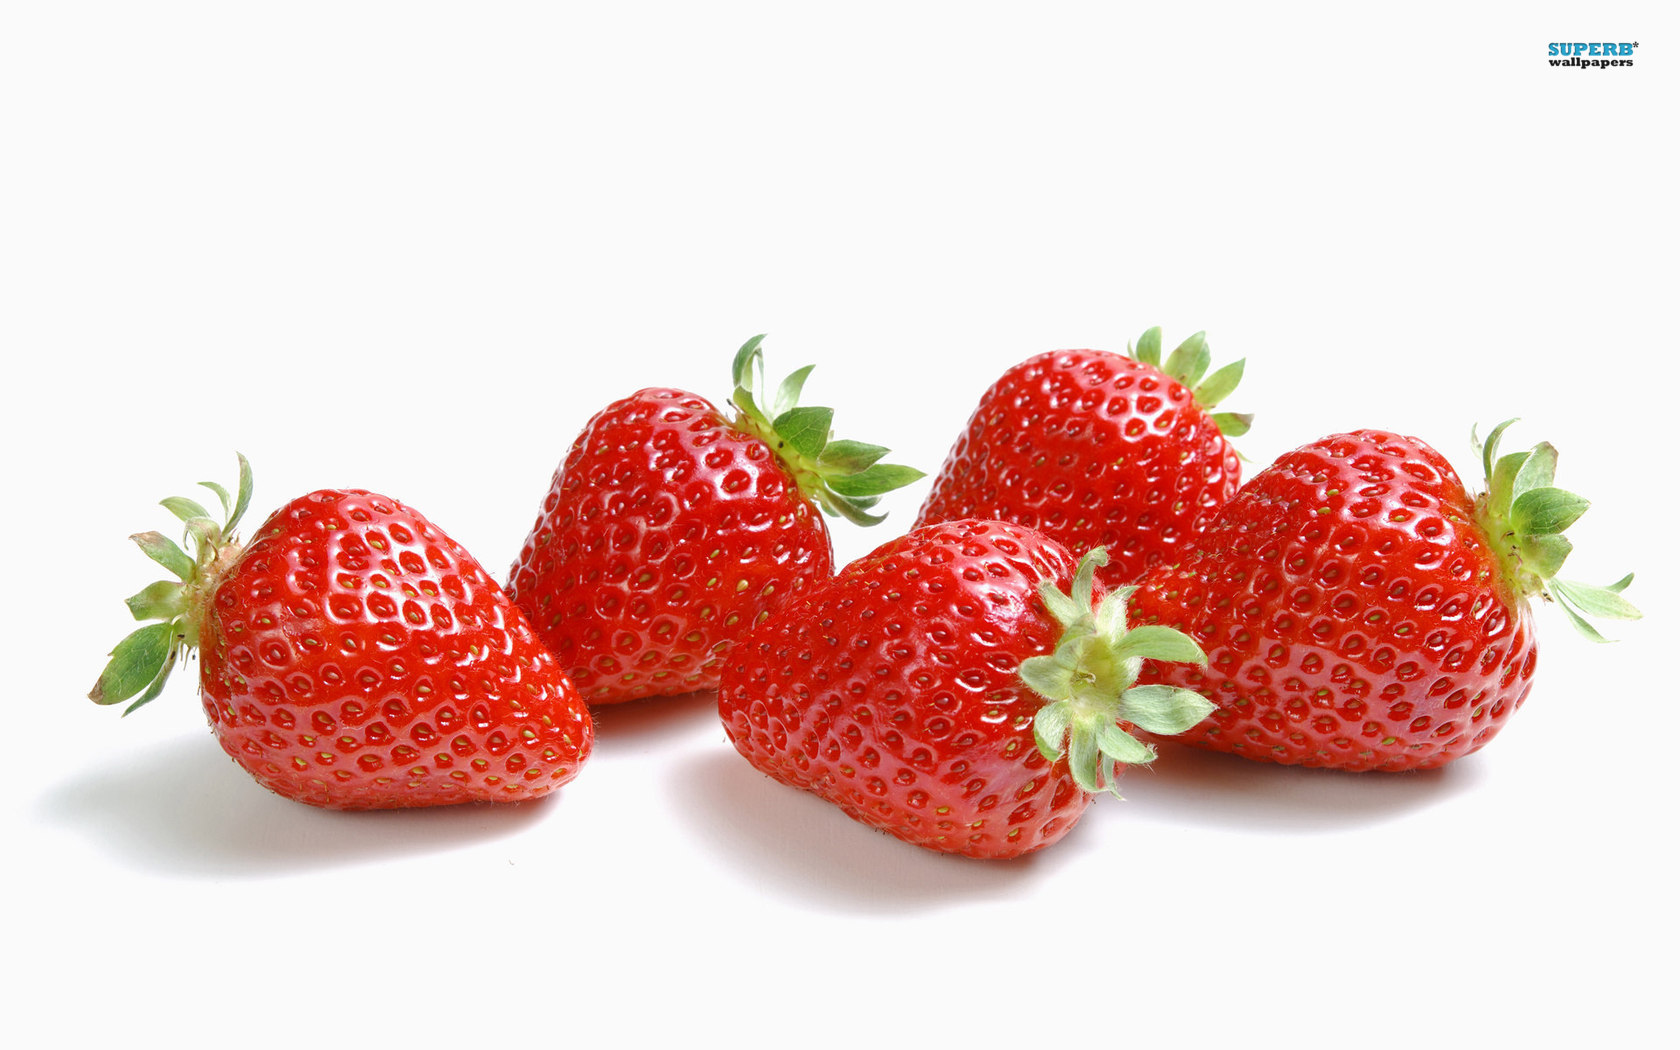 Strawberries wallpaper 1680x1050